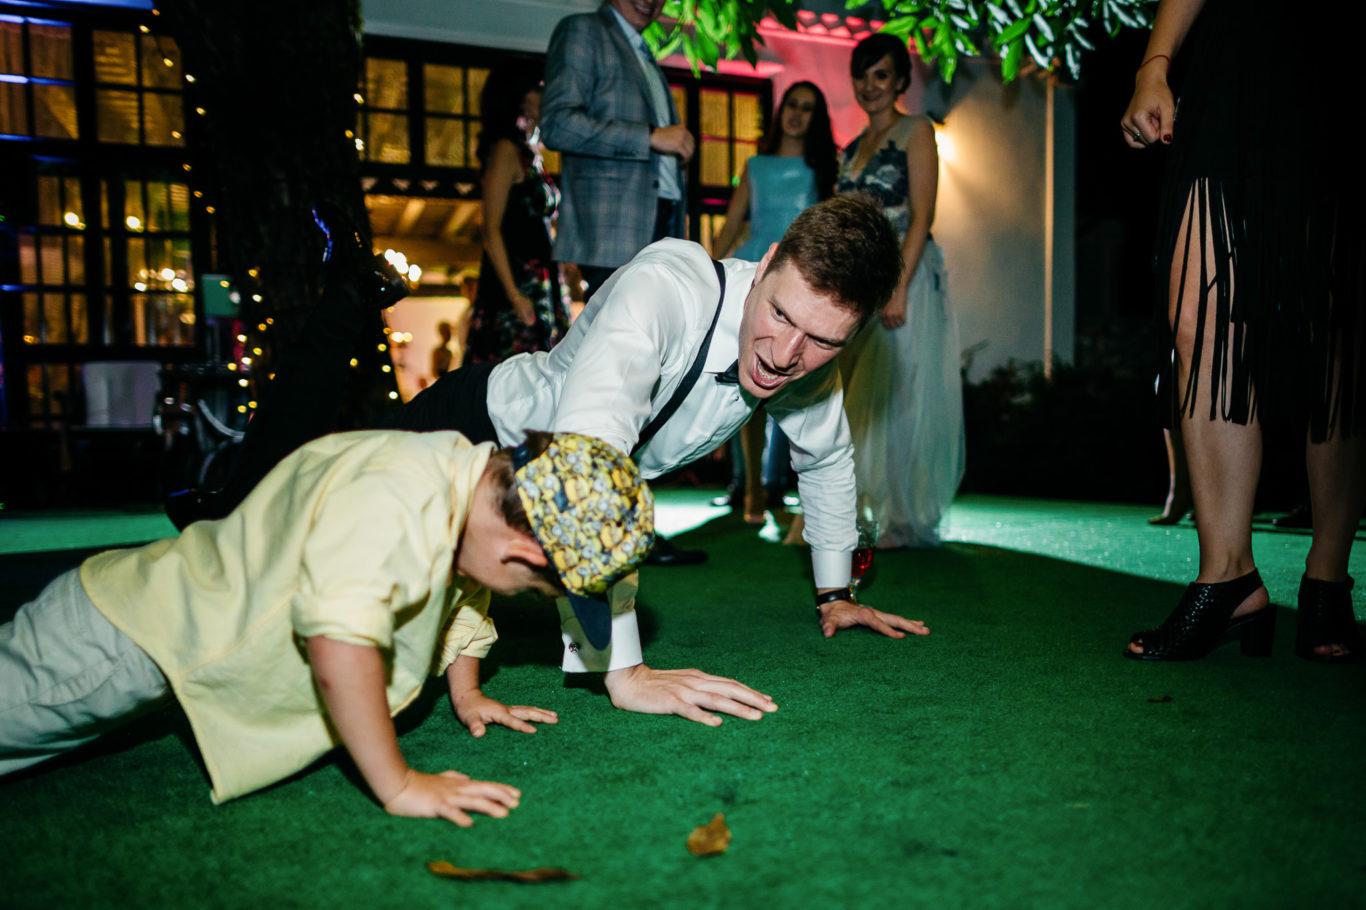 0566-fotoreportaj-nunta-conacul-maldar-cristina-stefan-fotograf-ciprian-dumitrescu-dc1_2814